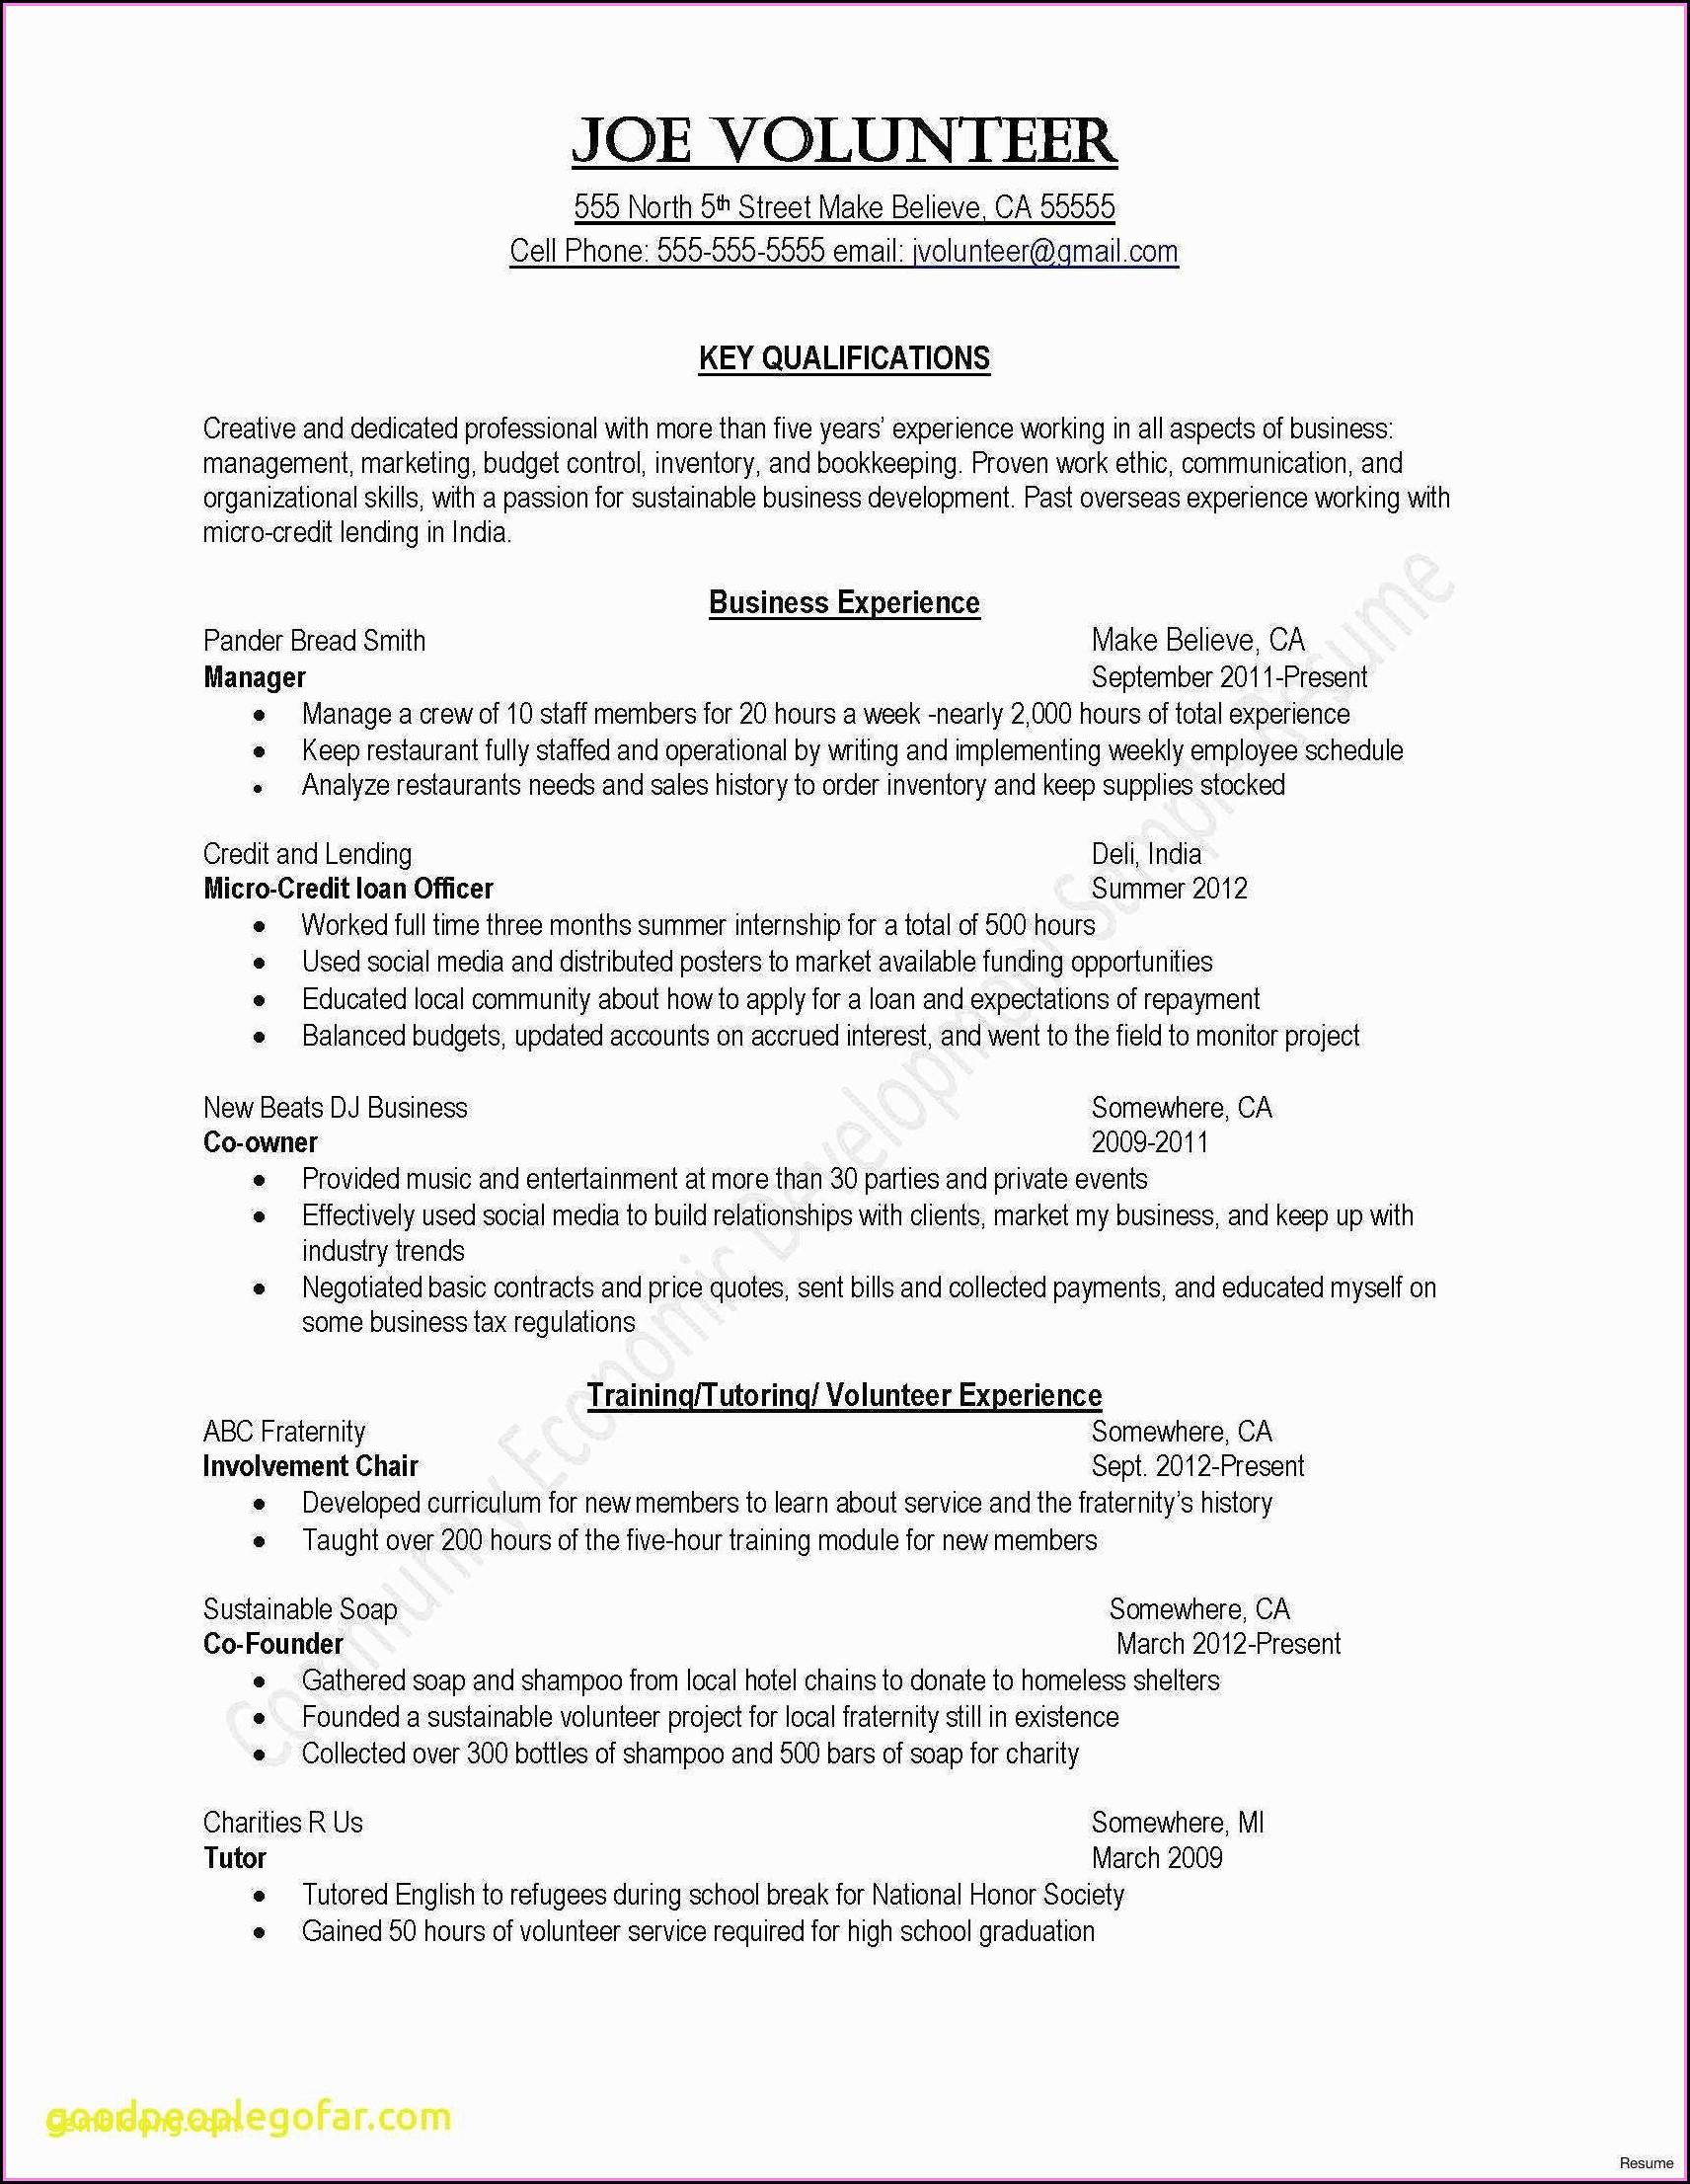 Best Job Sites To Post Resume